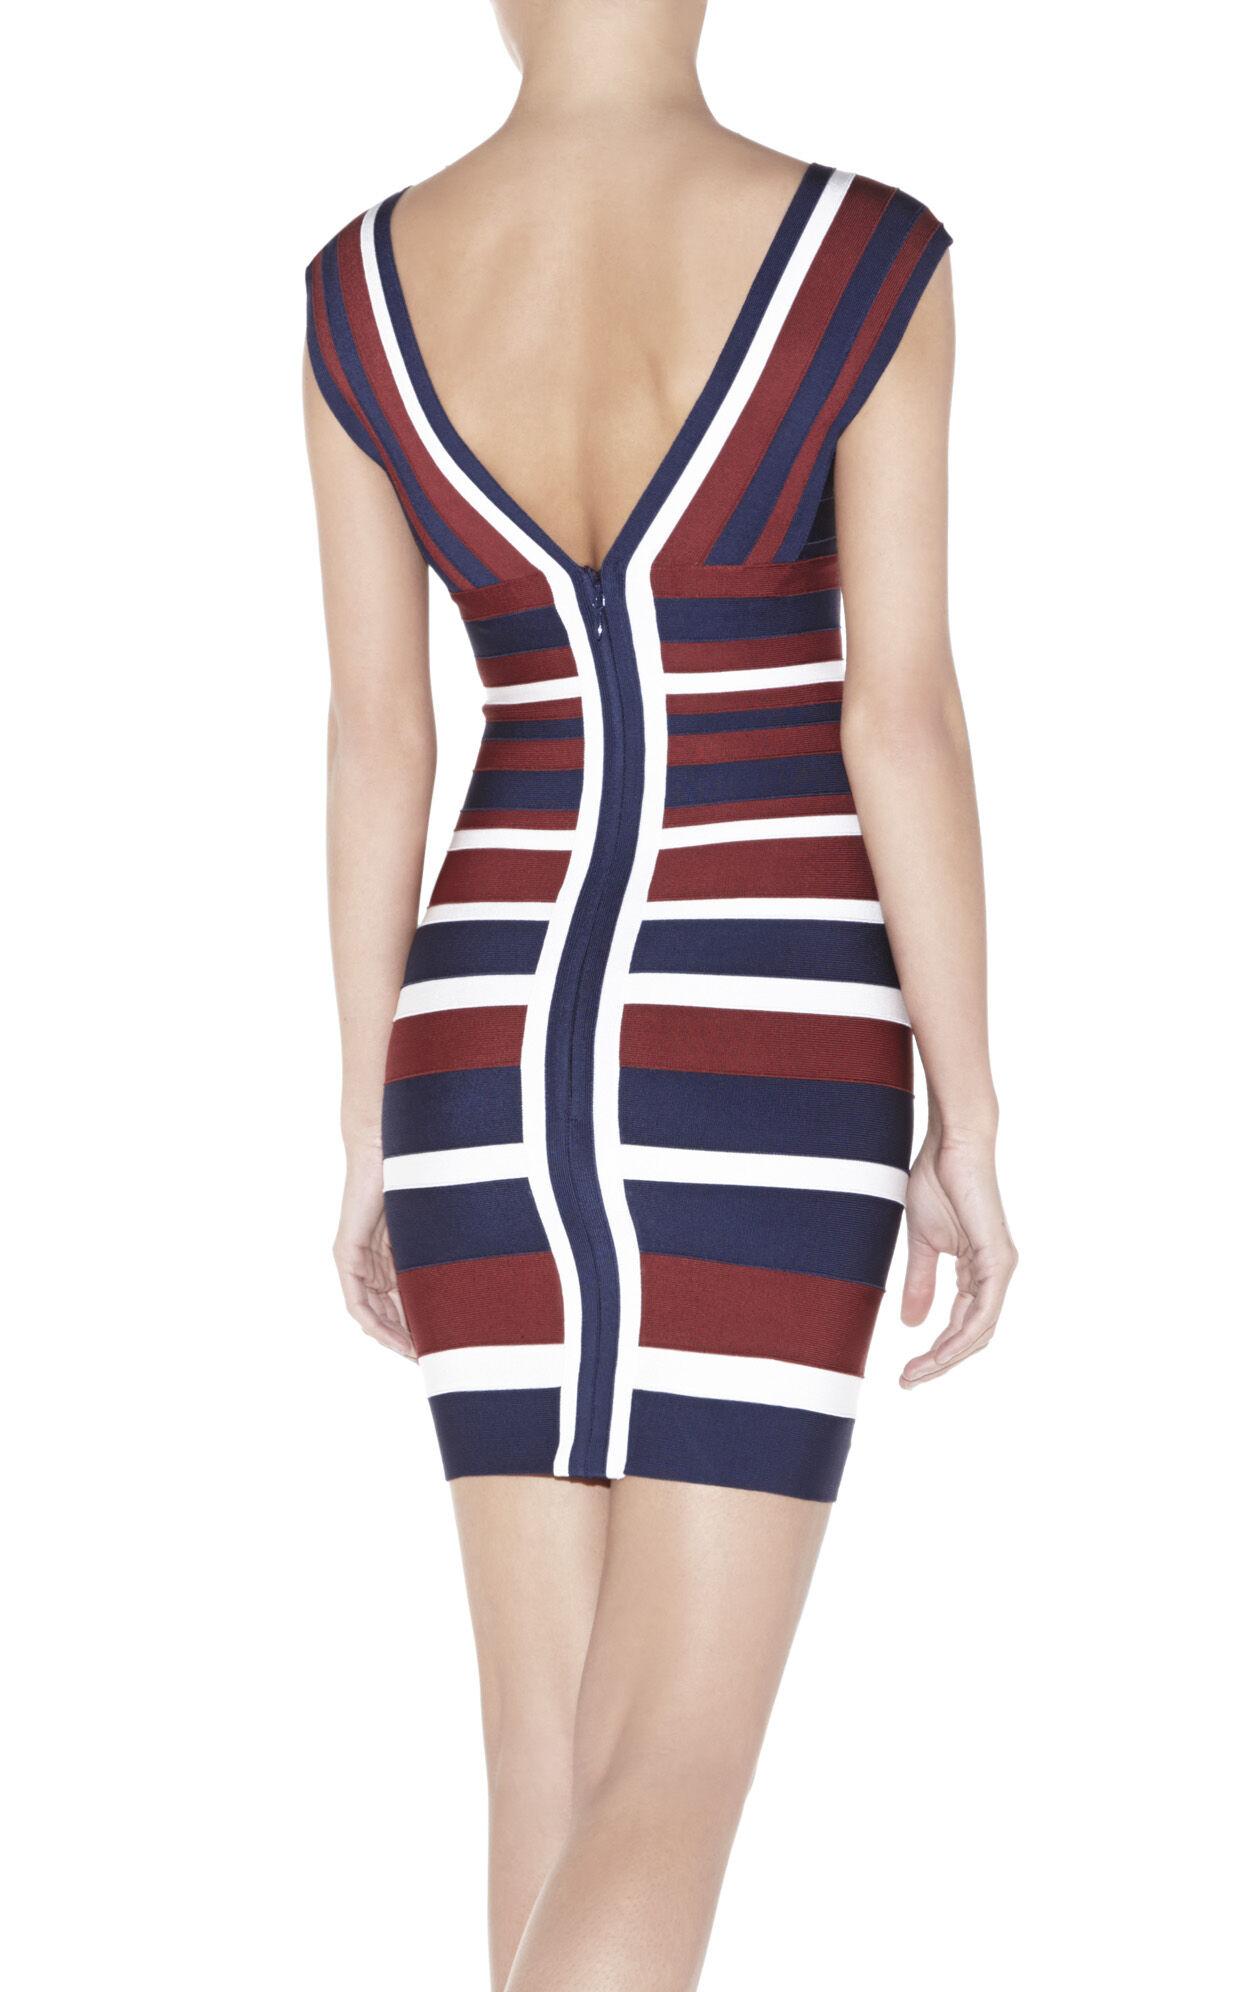 Jette Multi Colorblocked Dress